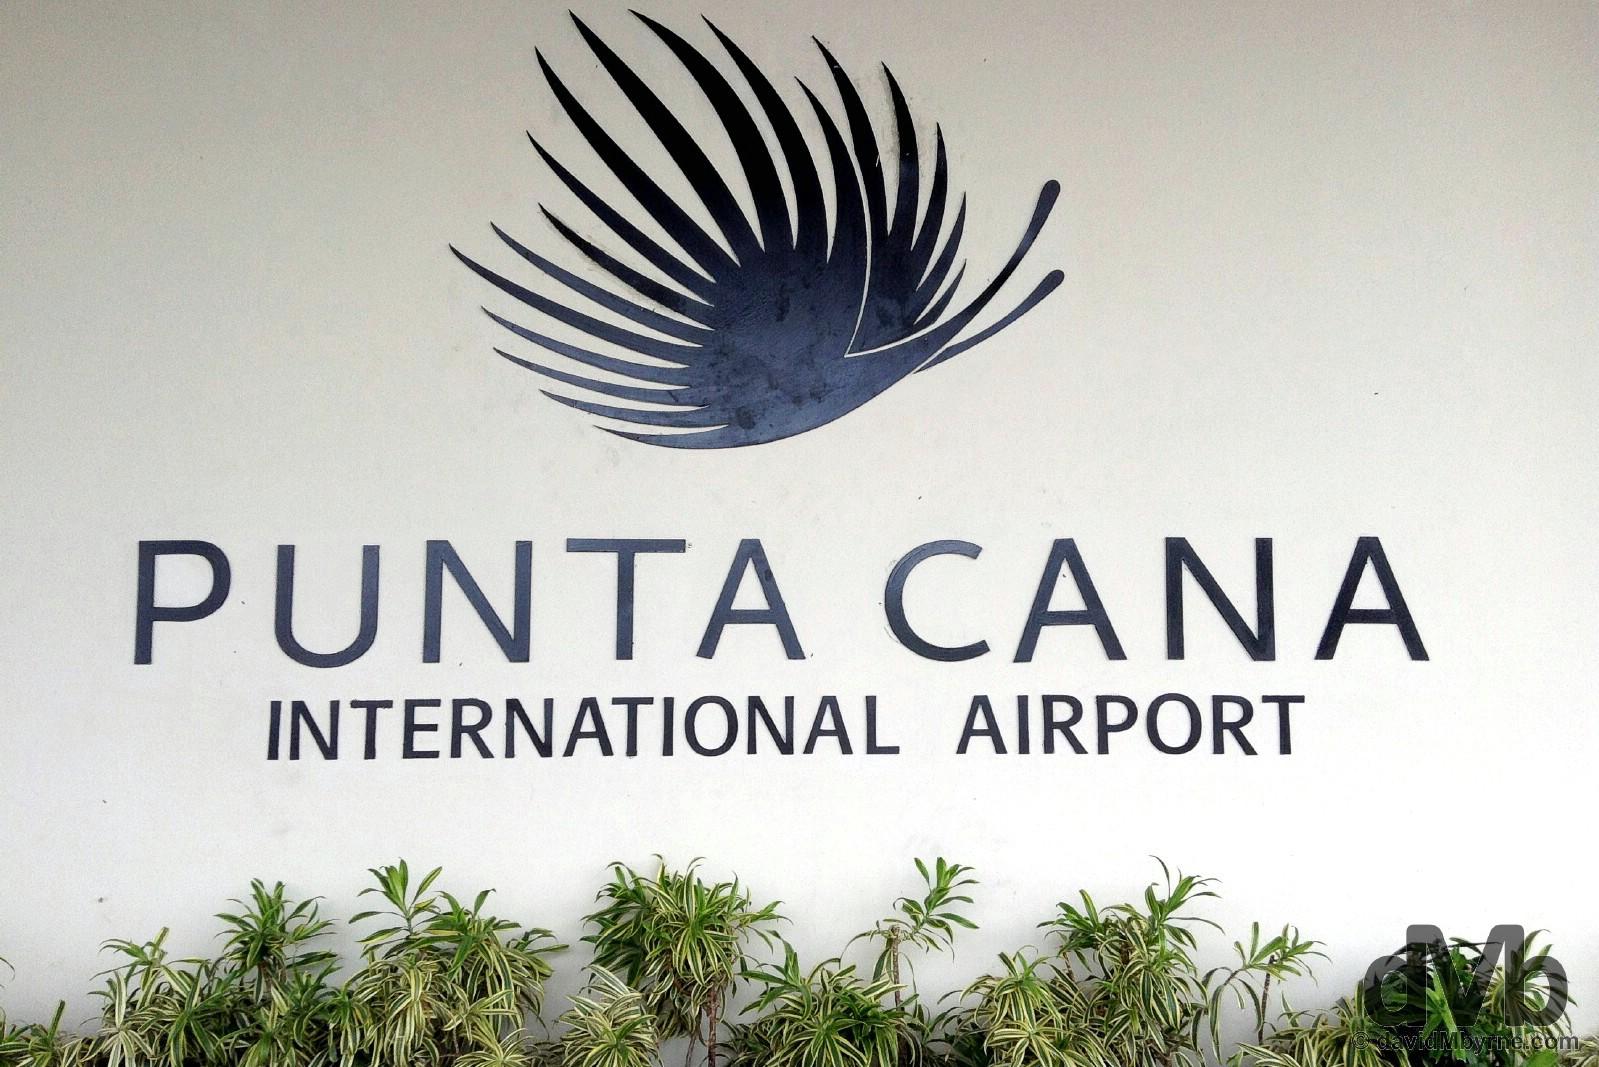 Punta Cana International Airport, Dominican Republic. May 29, 2015.